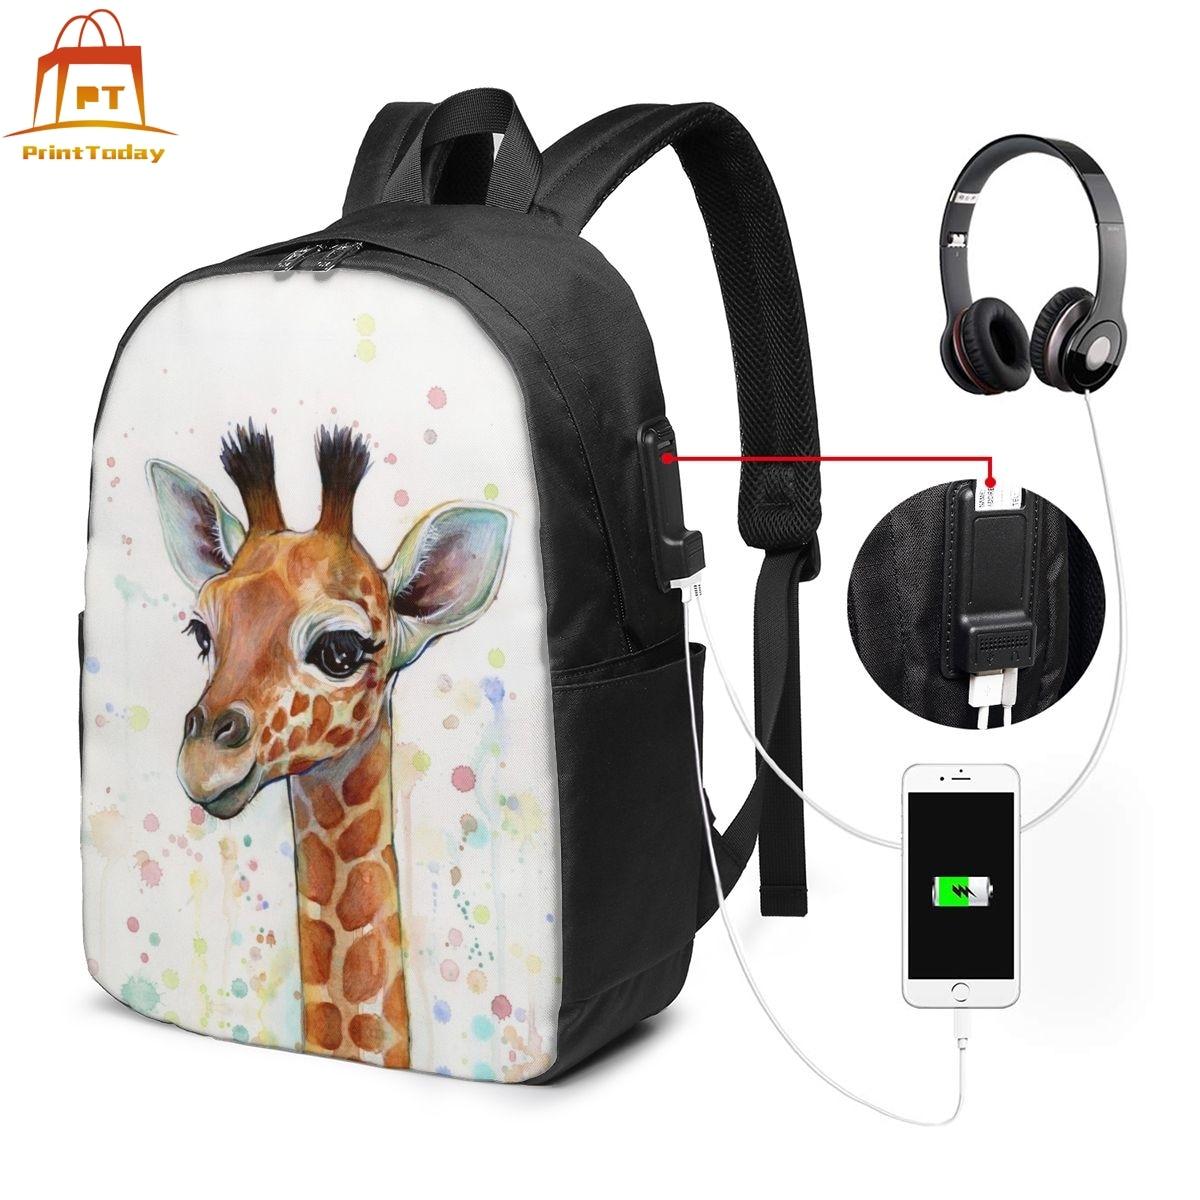 98 jirafa 571 bebé jirafa acuarela pintura decoración para dormitorio infantil 00